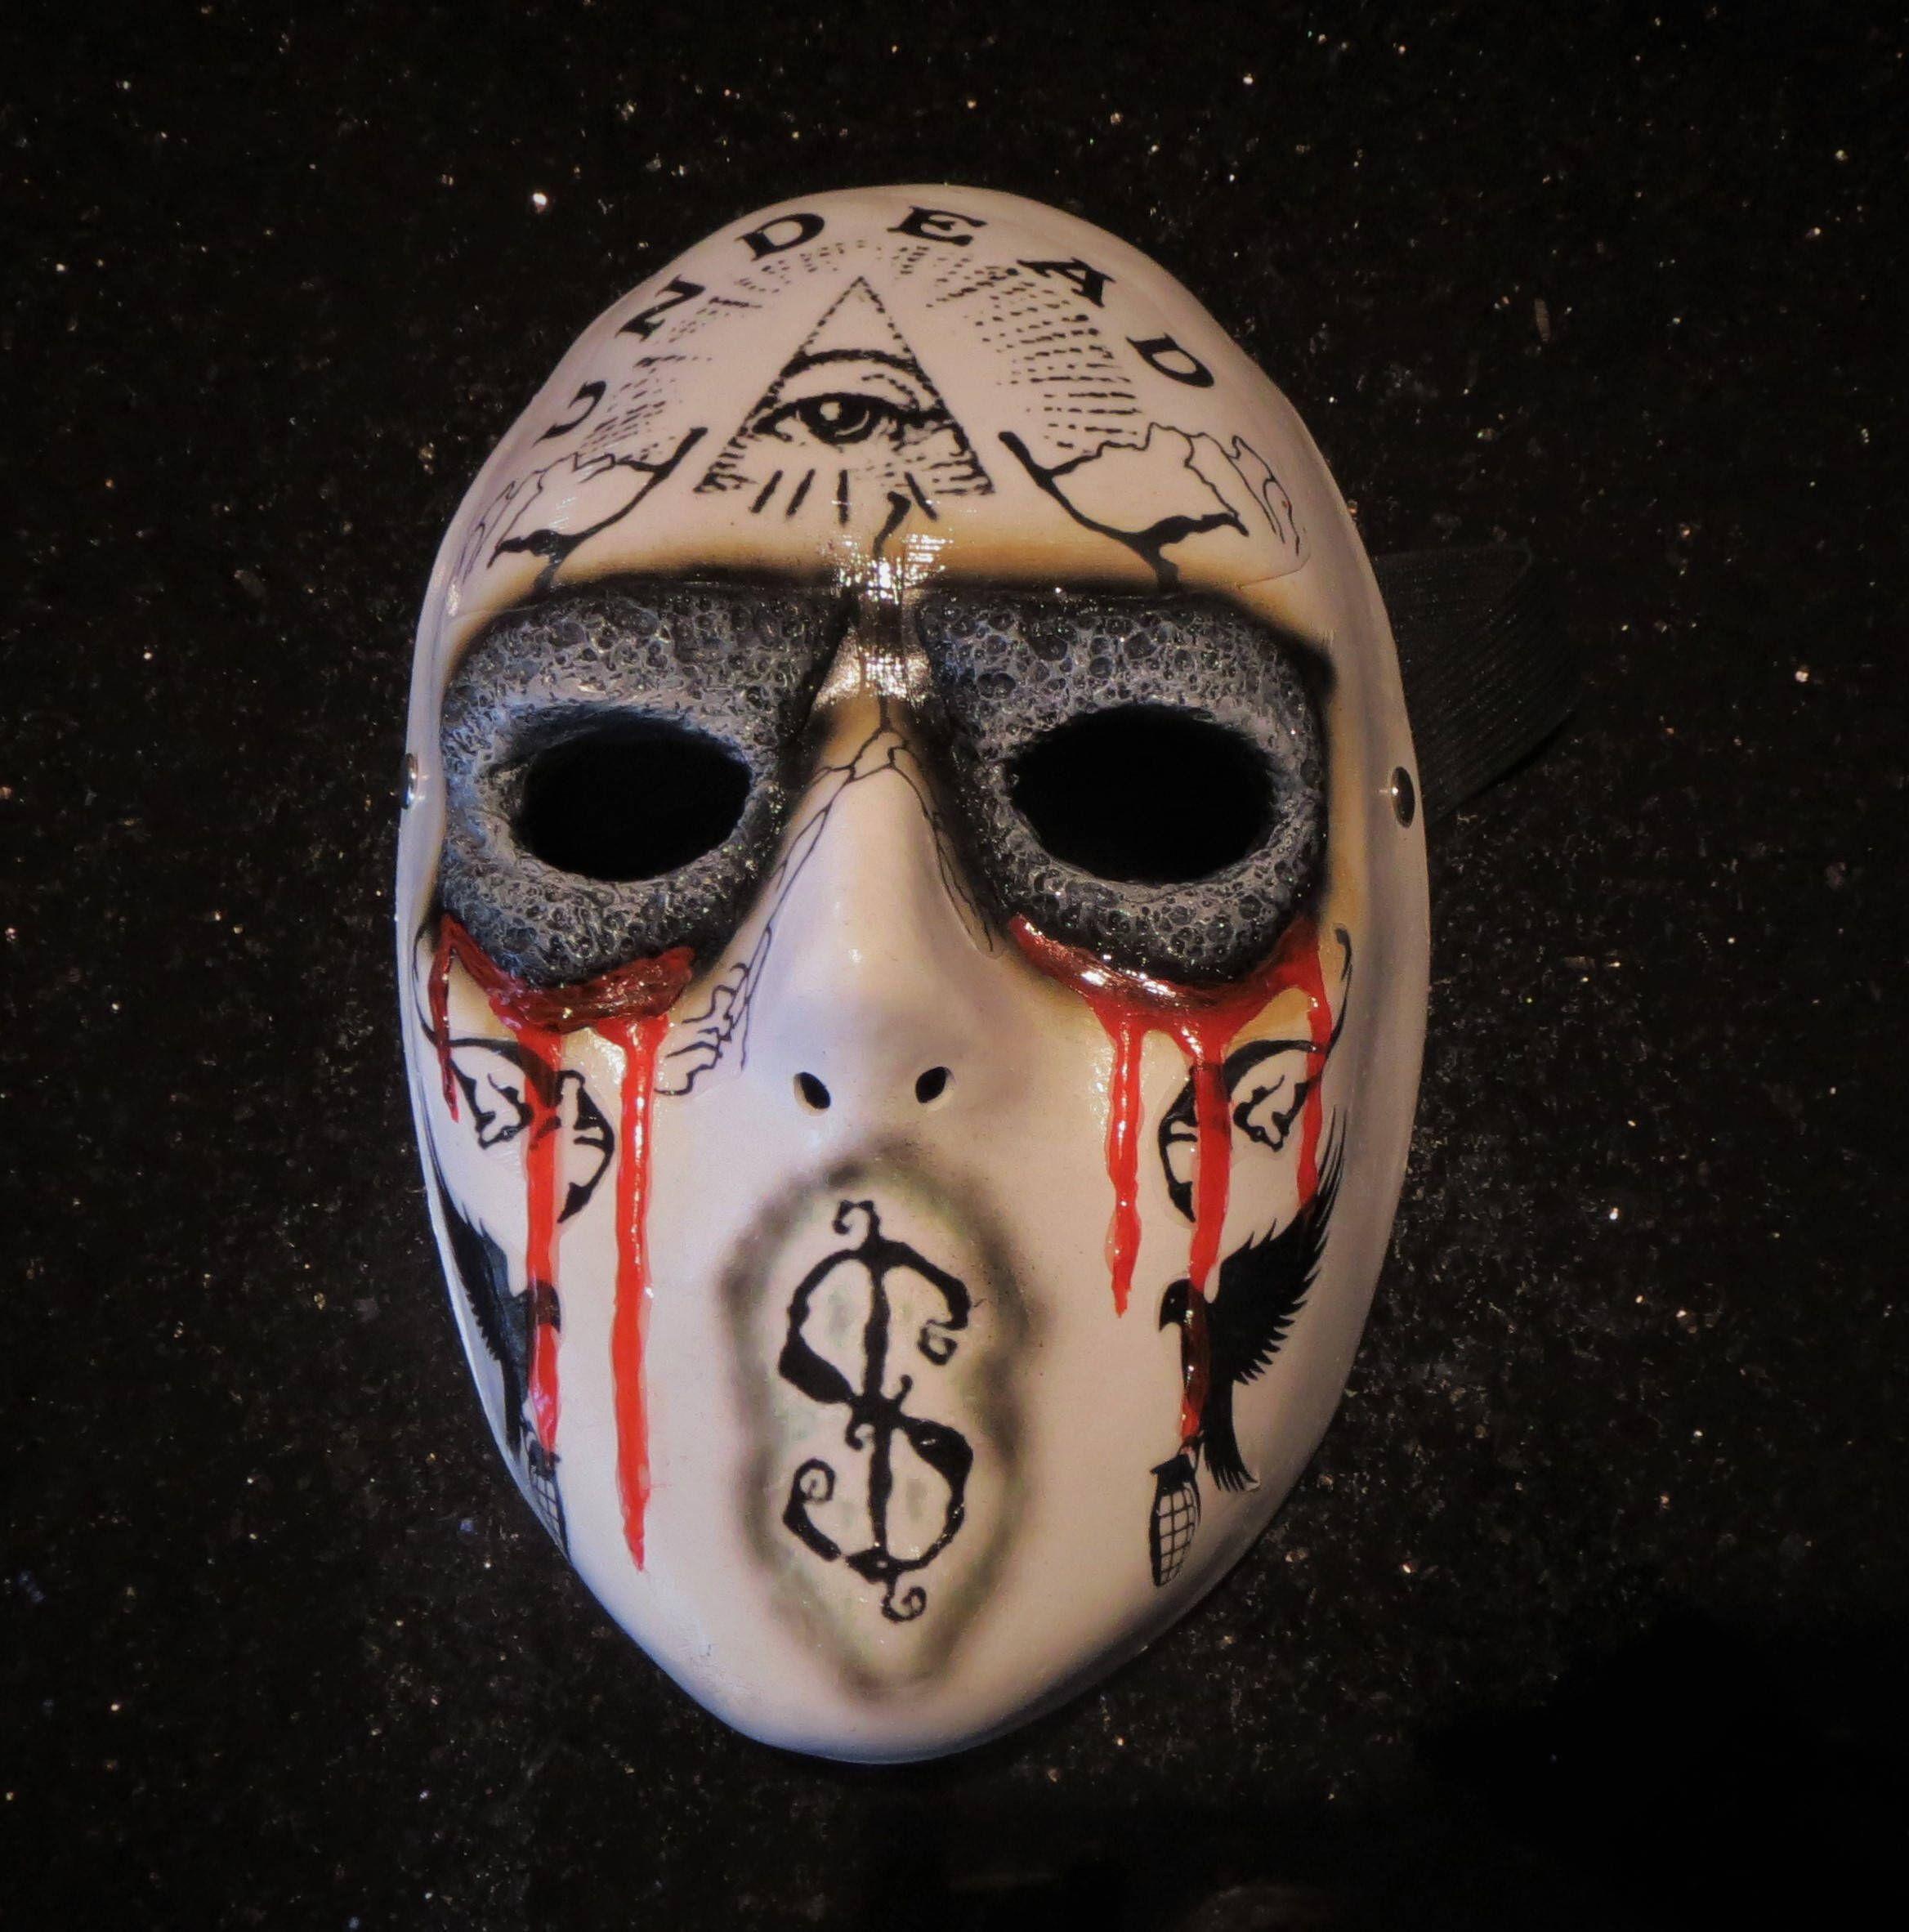 hollywood undead jdog mask day of the dead masks